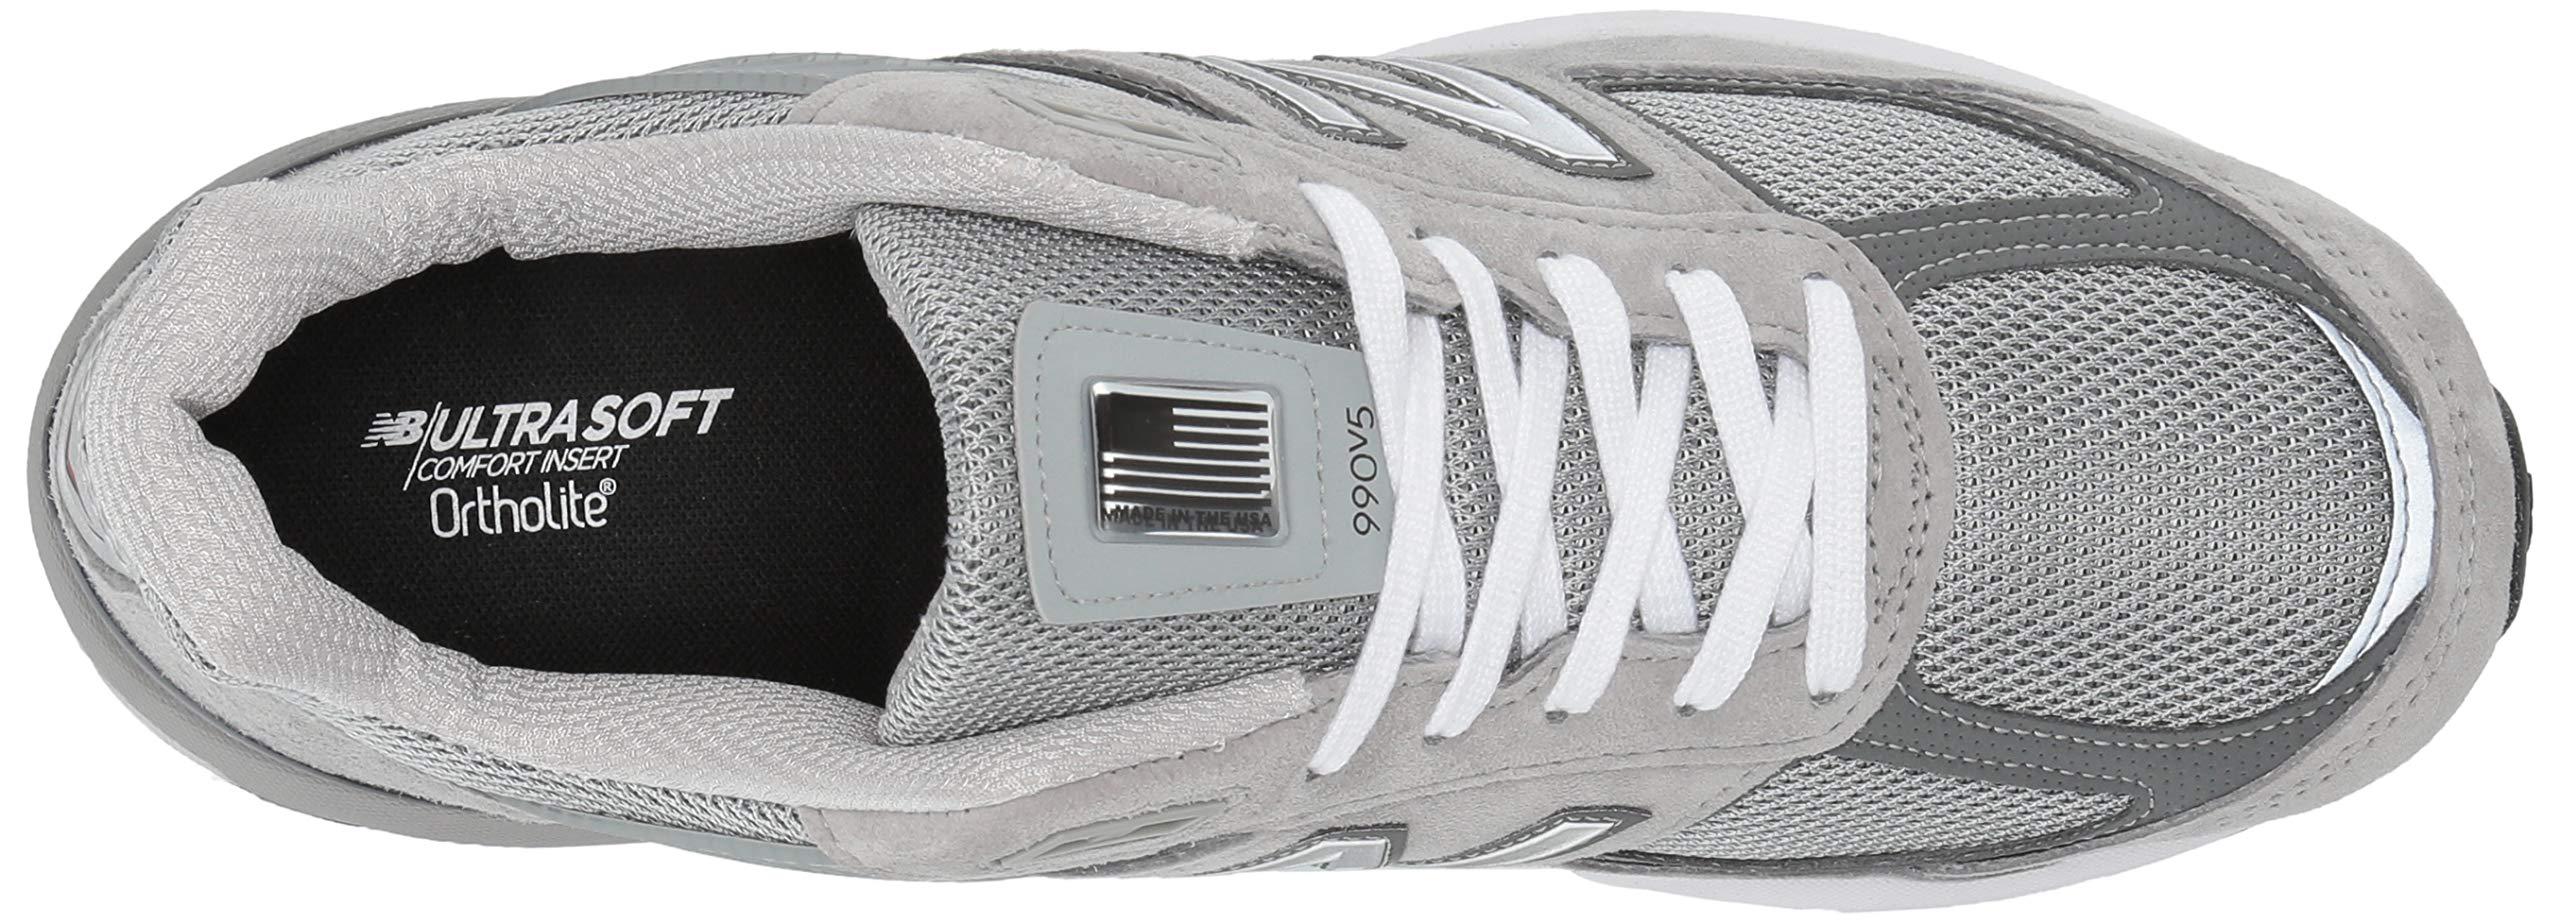 super popular 7452e 28f30 Amazon.com  New Balance Athletic Shoe, Inc.